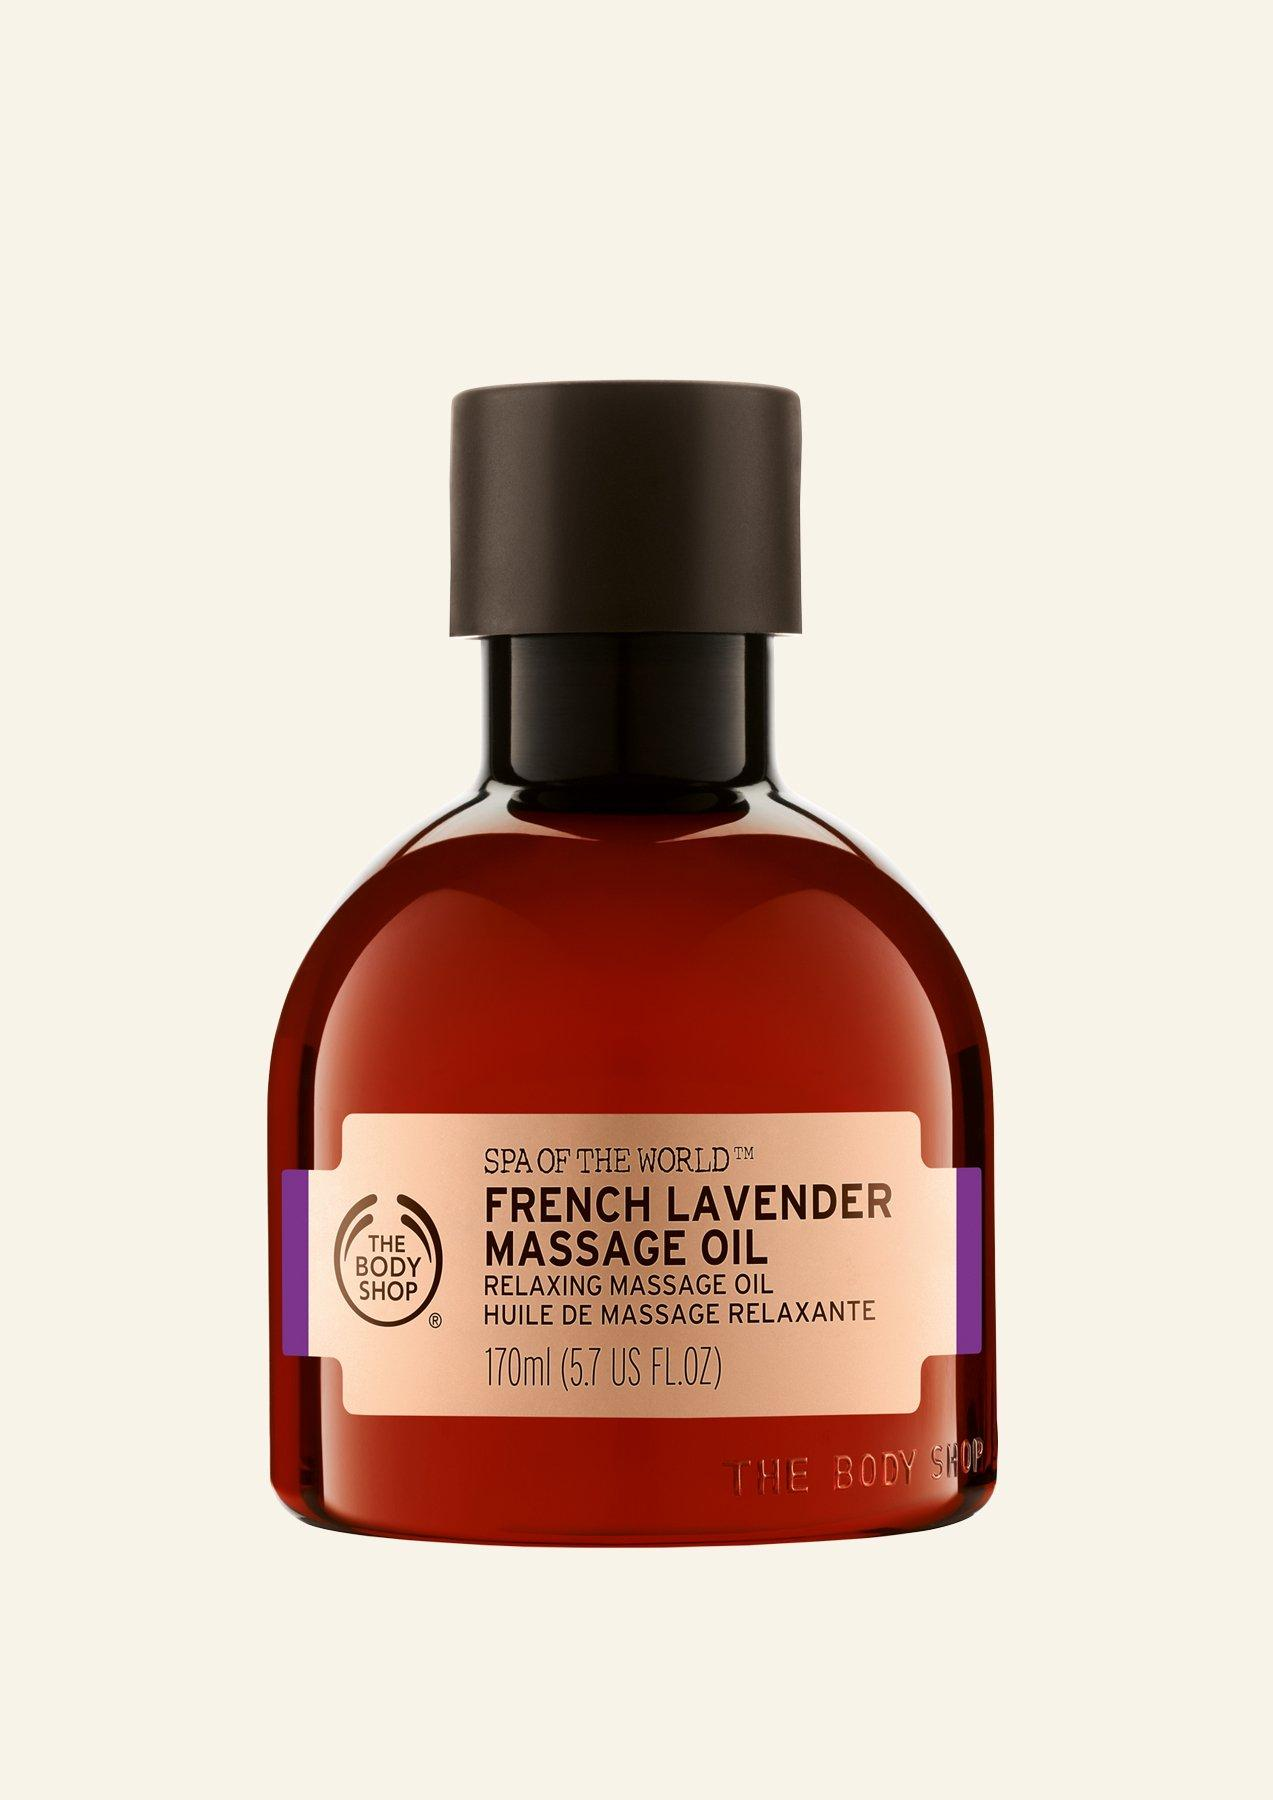 Vaj për masazh Spa of the World™ French Lavender